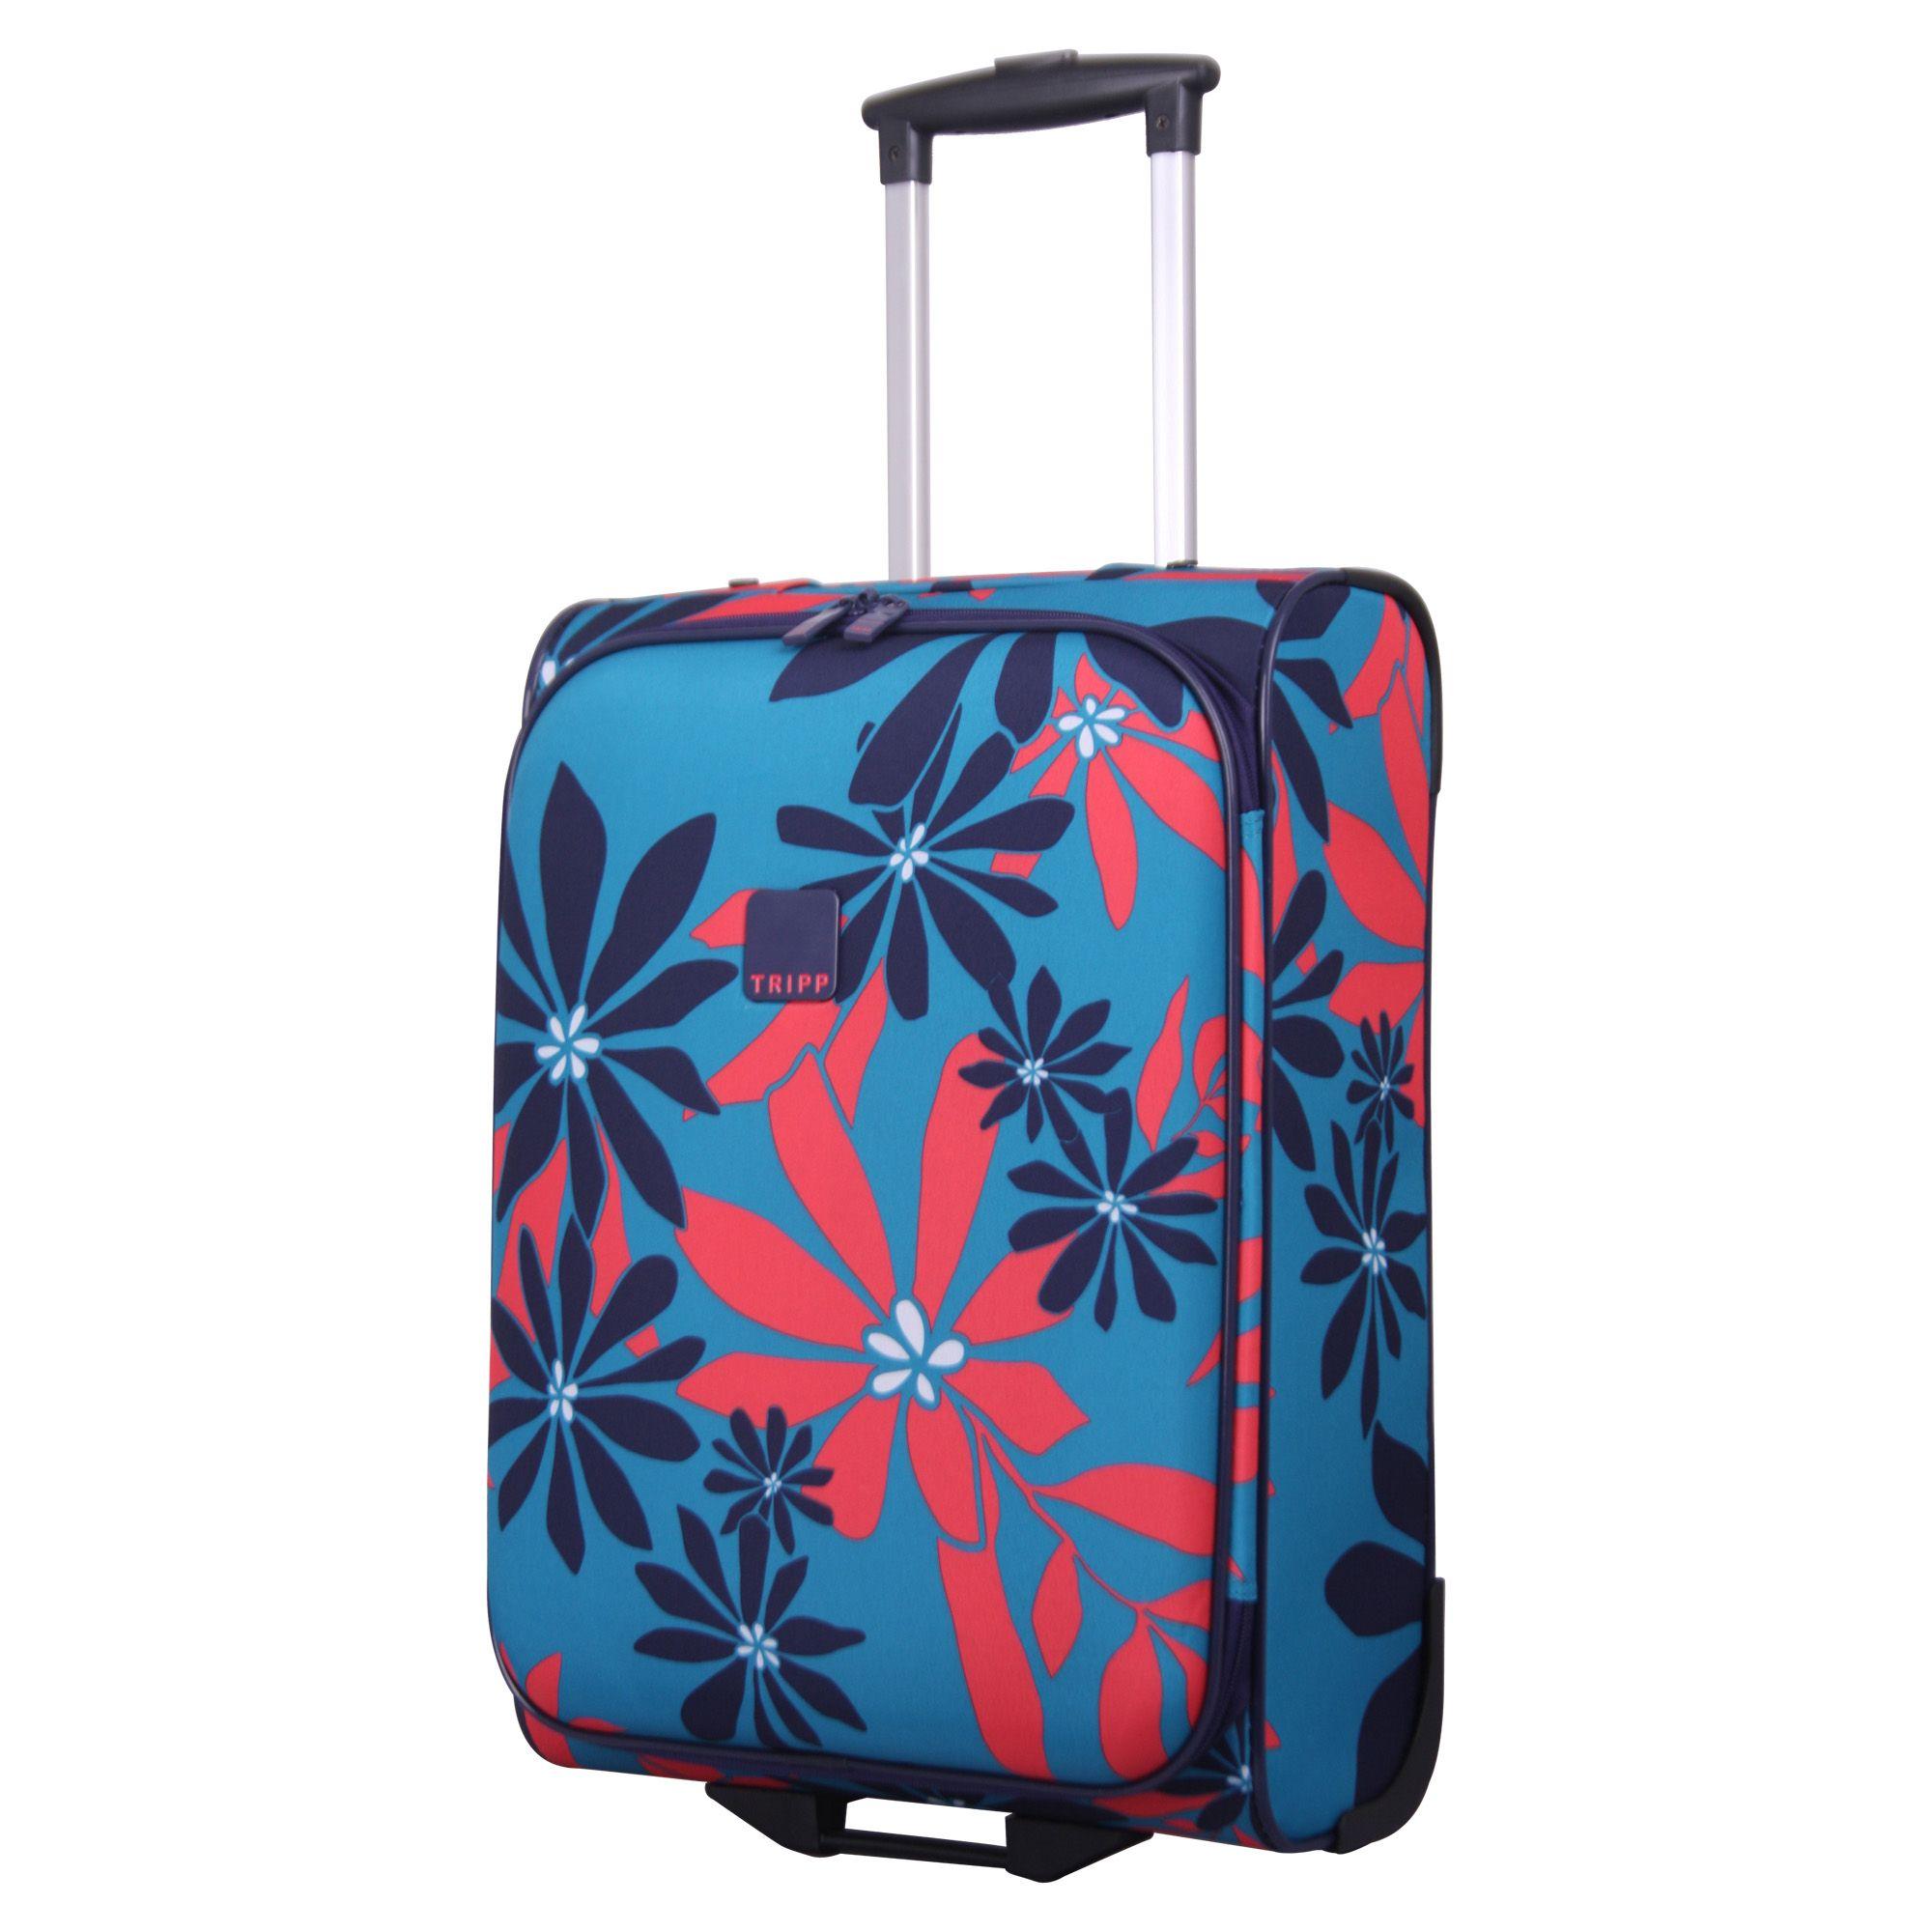 tripp ultramarine poppy 39 sunshine flower 39 cabin 2w case. Black Bedroom Furniture Sets. Home Design Ideas